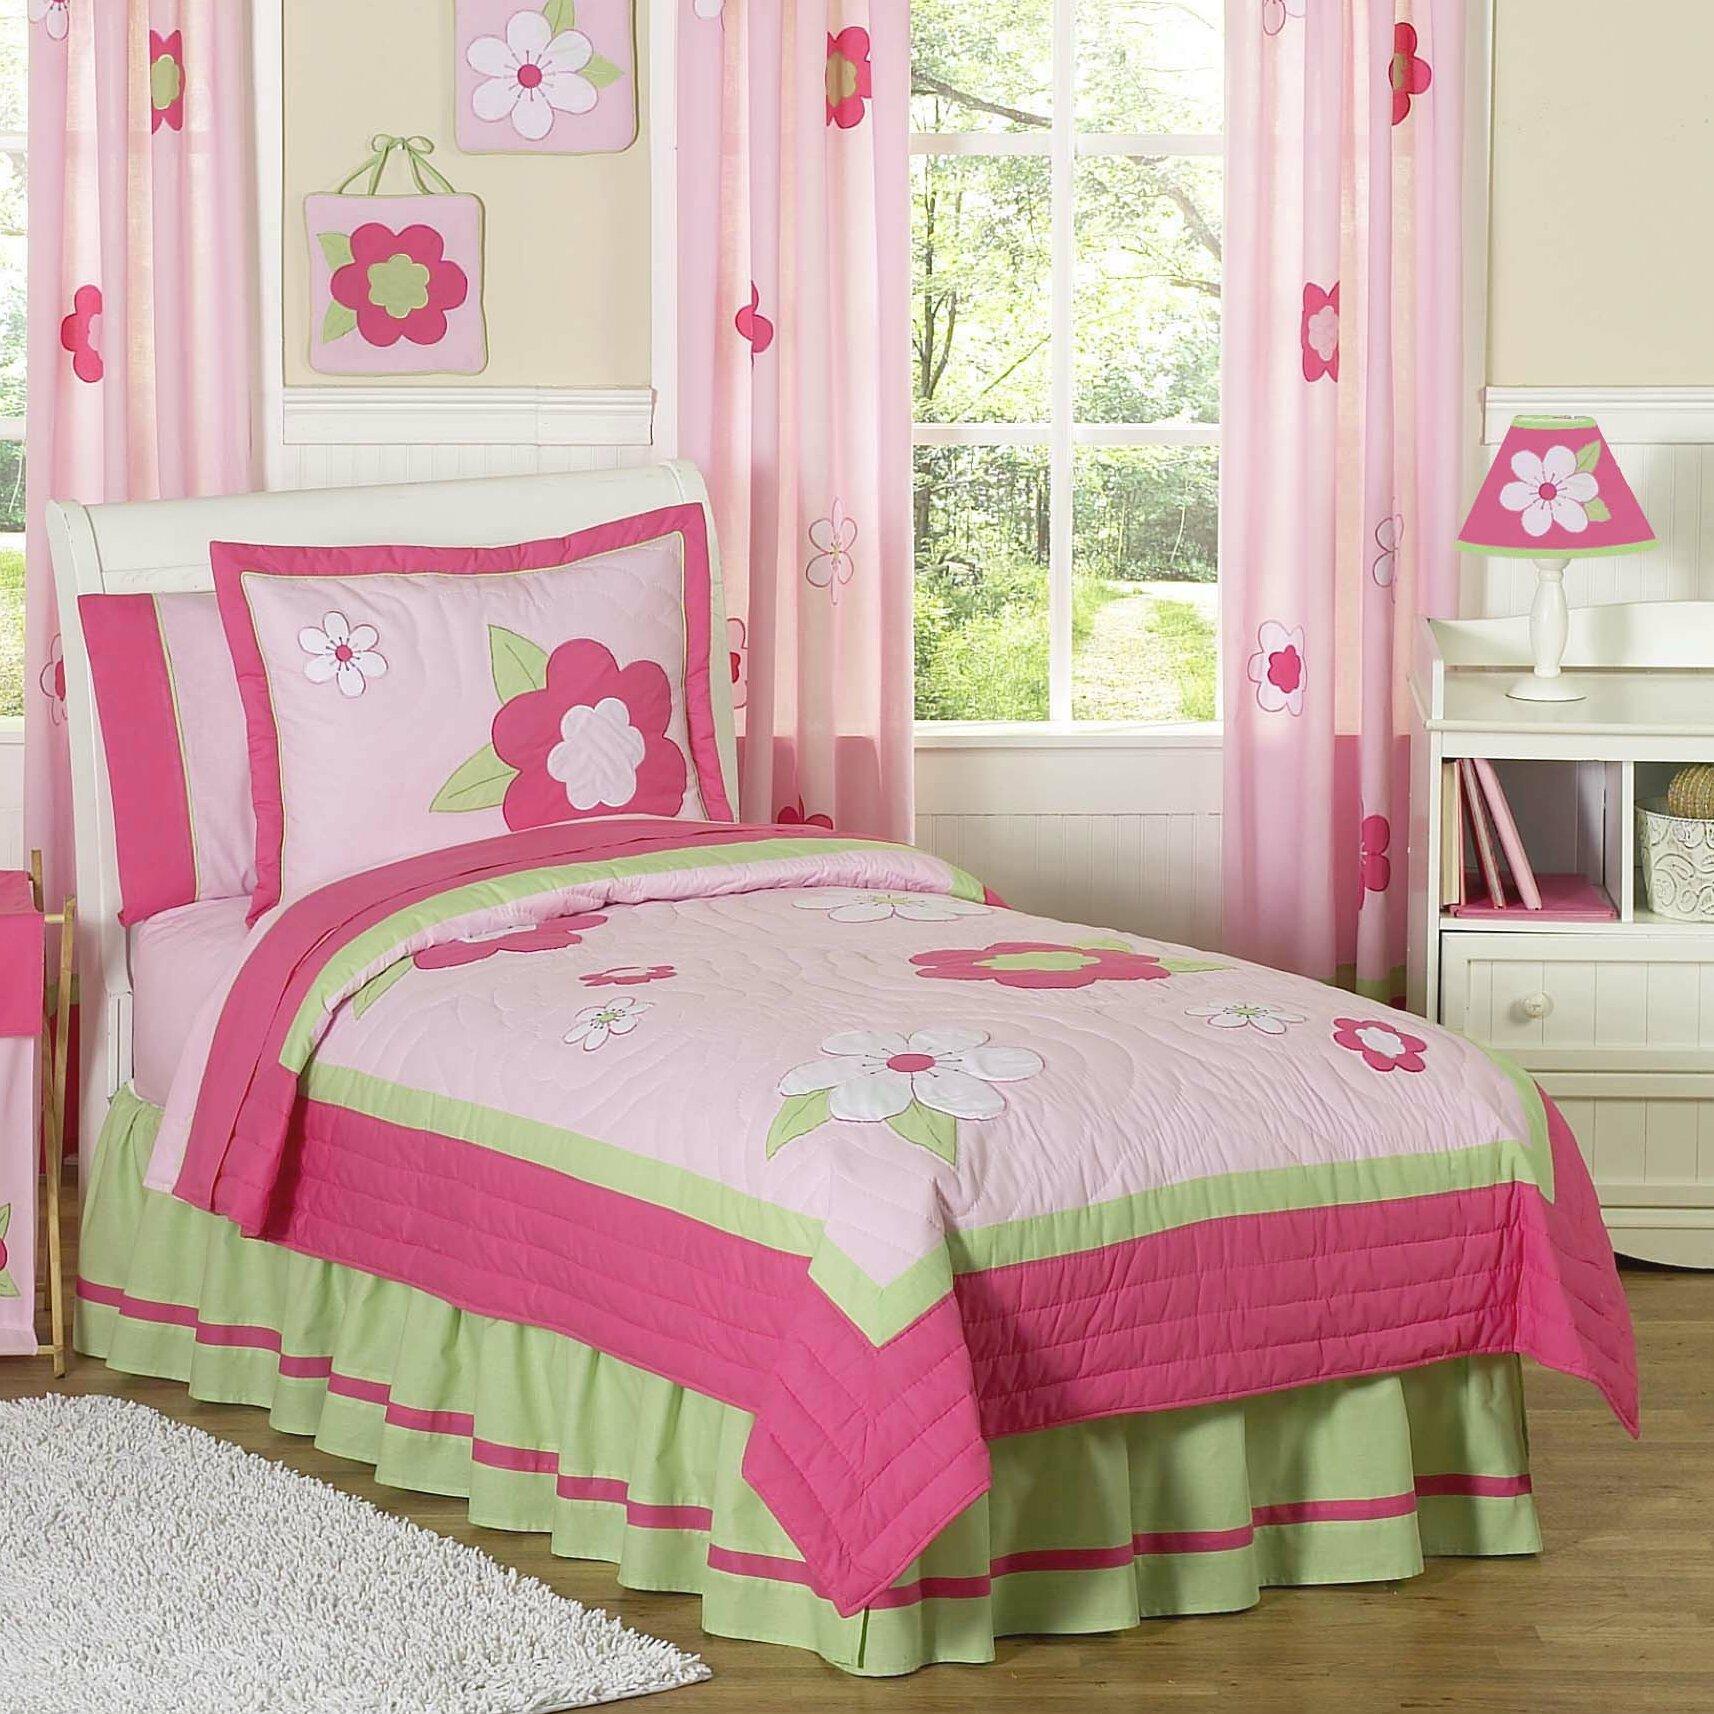 sweet jojo designs flower pink and green 4 piece twin comforter set reviews. Black Bedroom Furniture Sets. Home Design Ideas